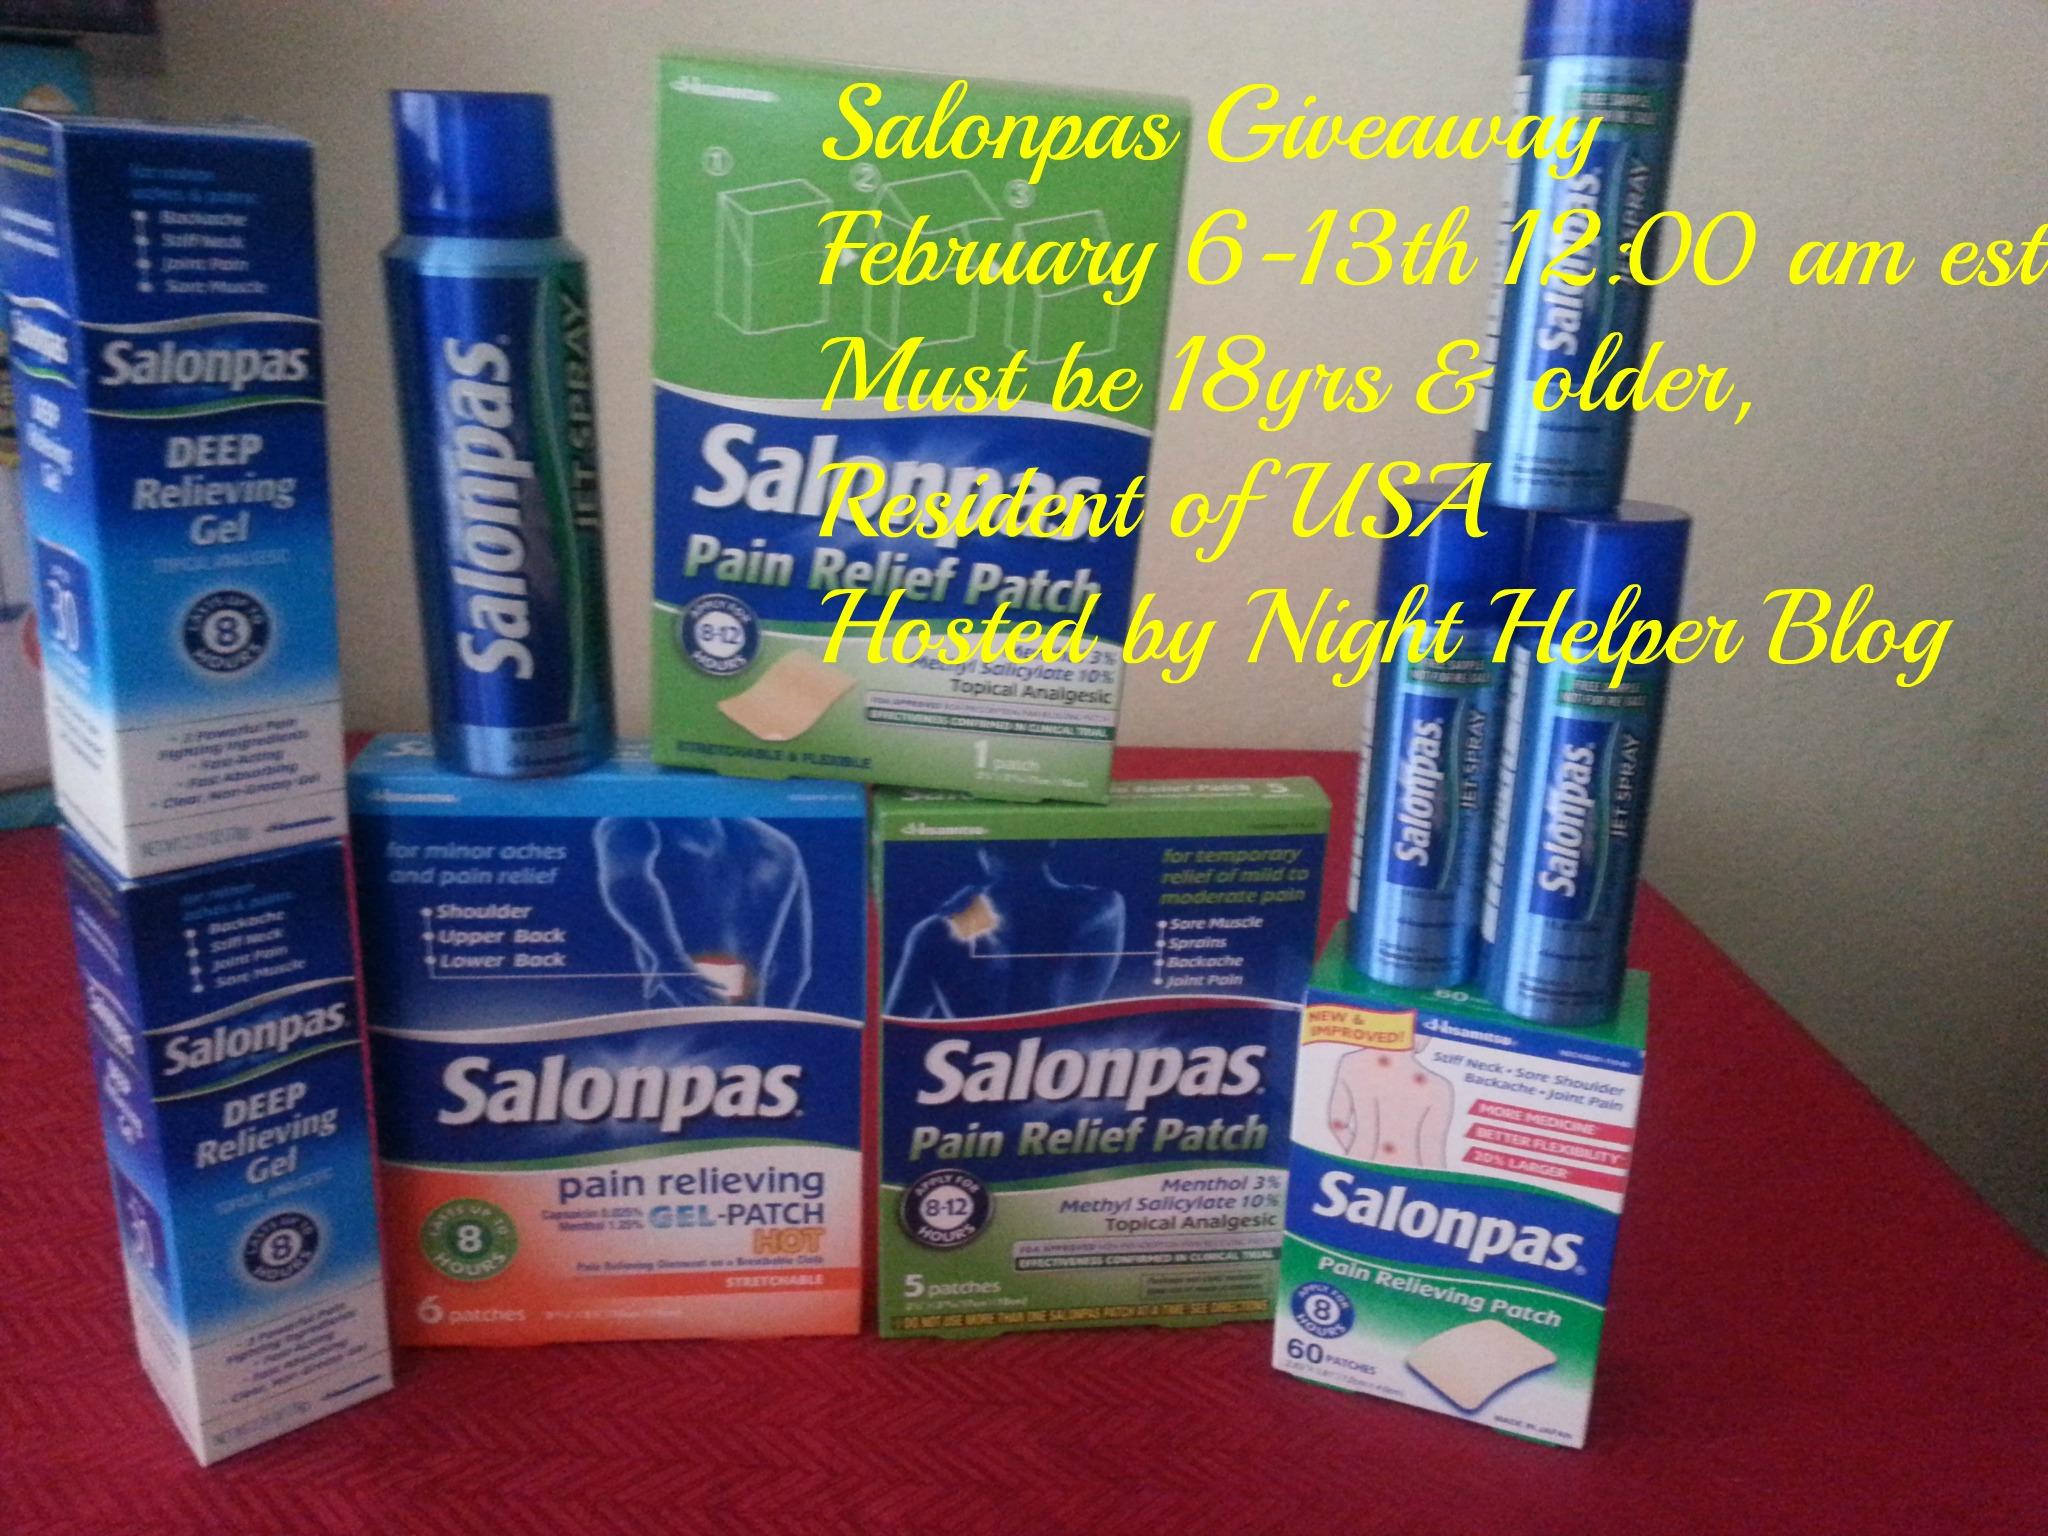 Salonpas Giveaway USA end 2/13